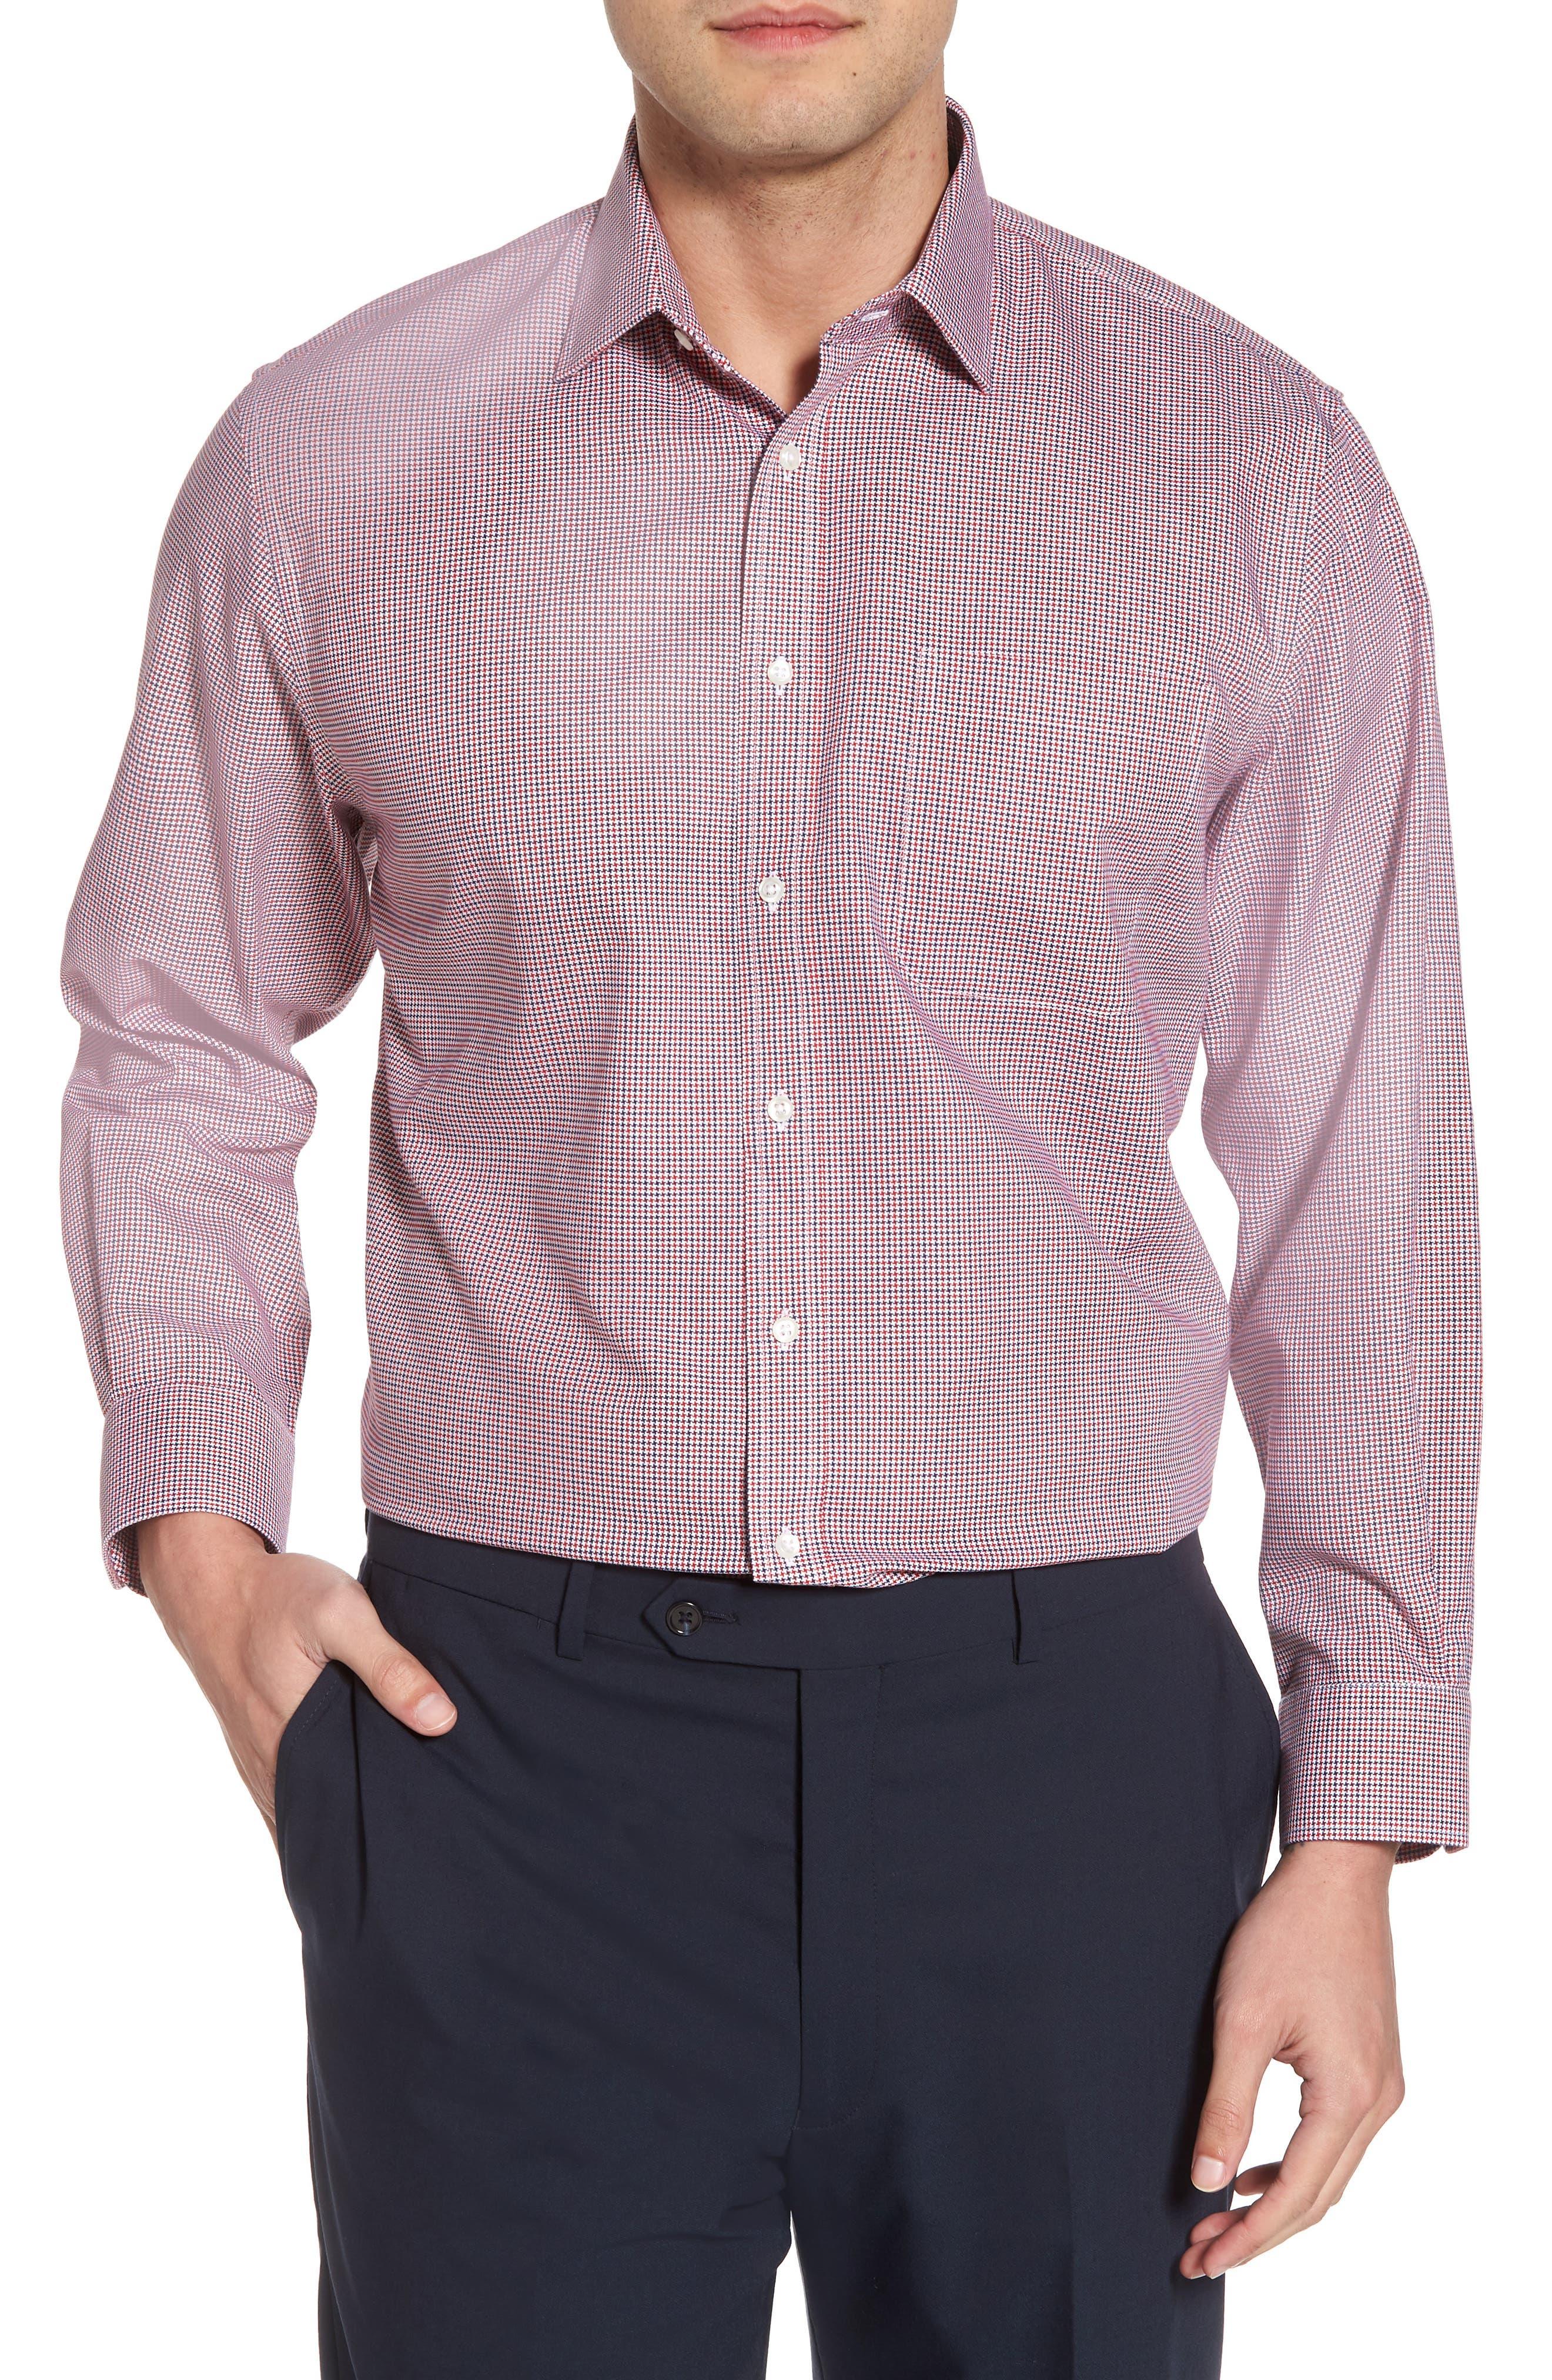 Main Image - Nordstrom Men's Shop Smartcare™ Traditional Fit Houndstooth Dress Shirt